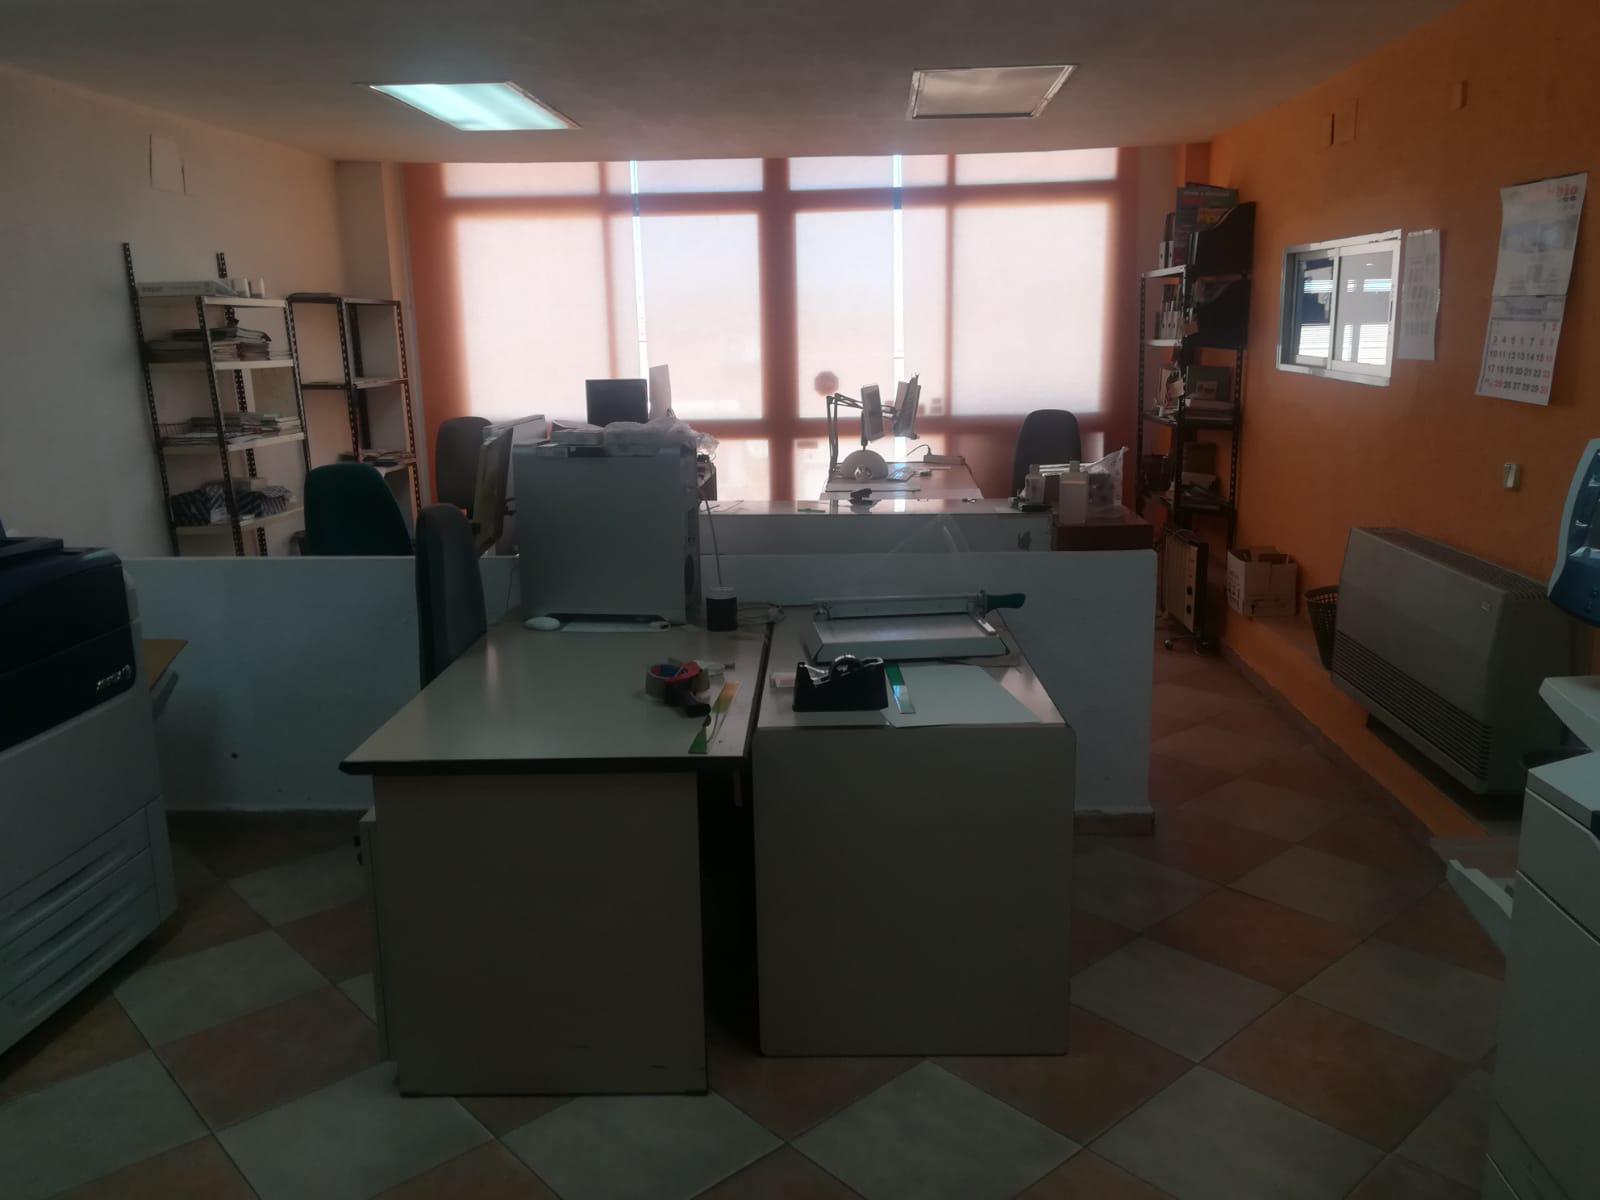 223281 - Nave industrial Villaverde (San Andrés)